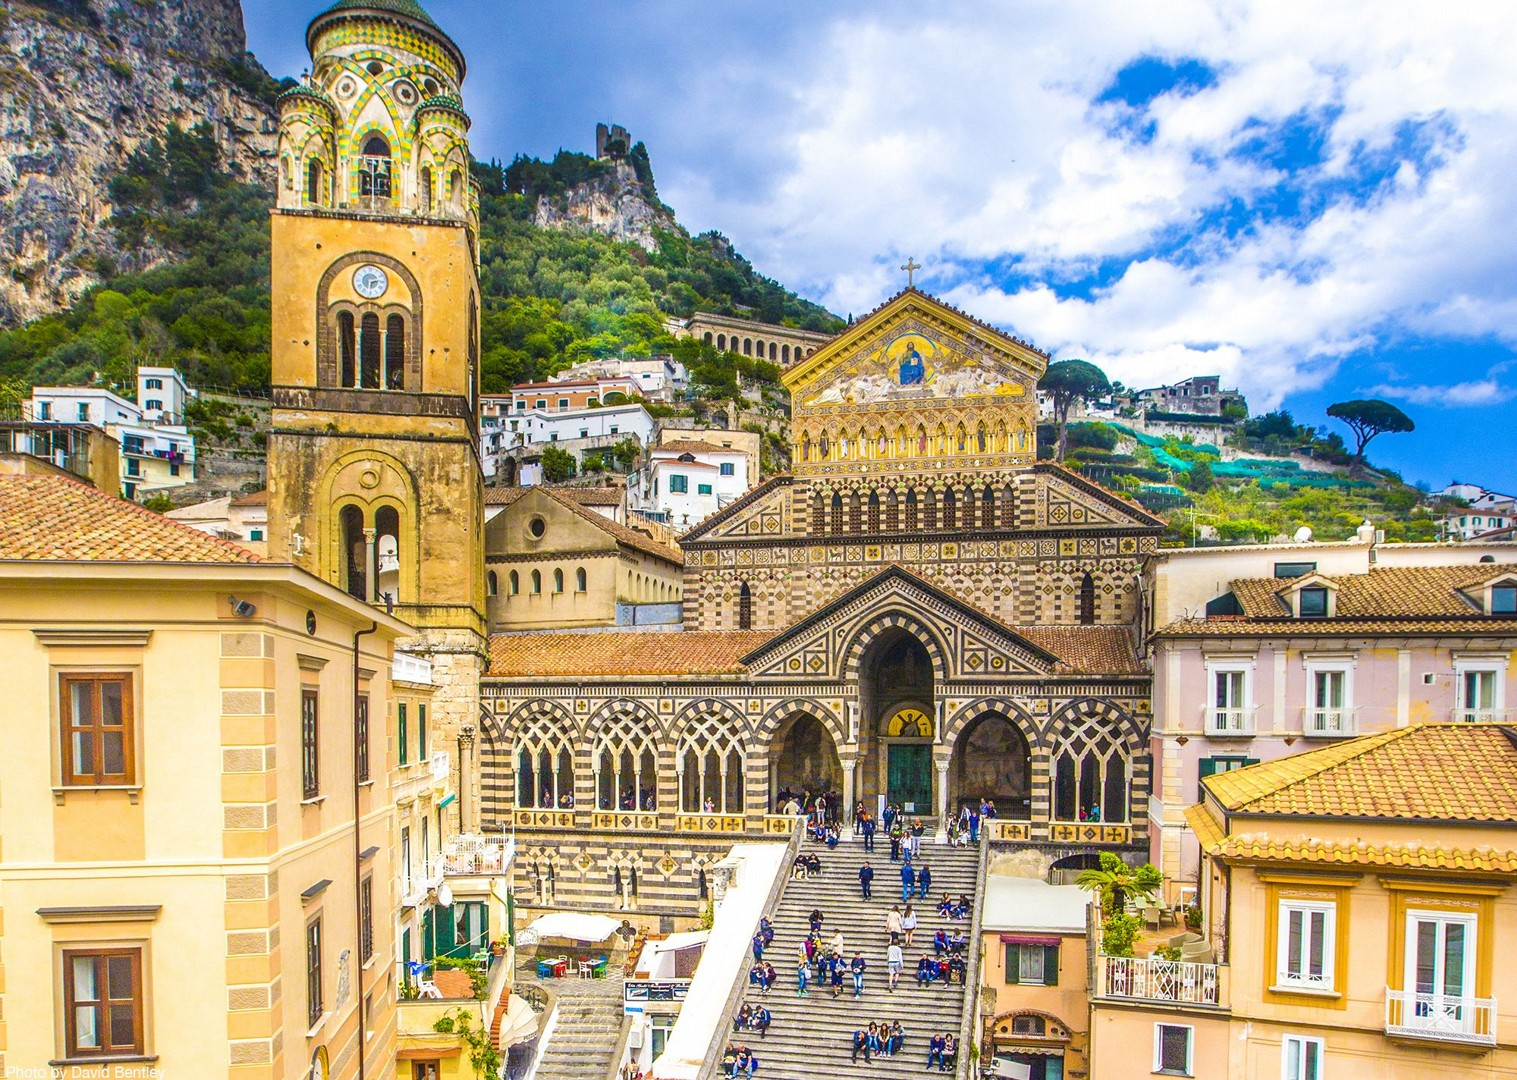 2017 Amalfi Coast_0327-2.jpg - Italy - Cilento and The Amalfi Coast - Self-Guided Leisure Cycling Holiday - Italia Leisure and Family Cycling